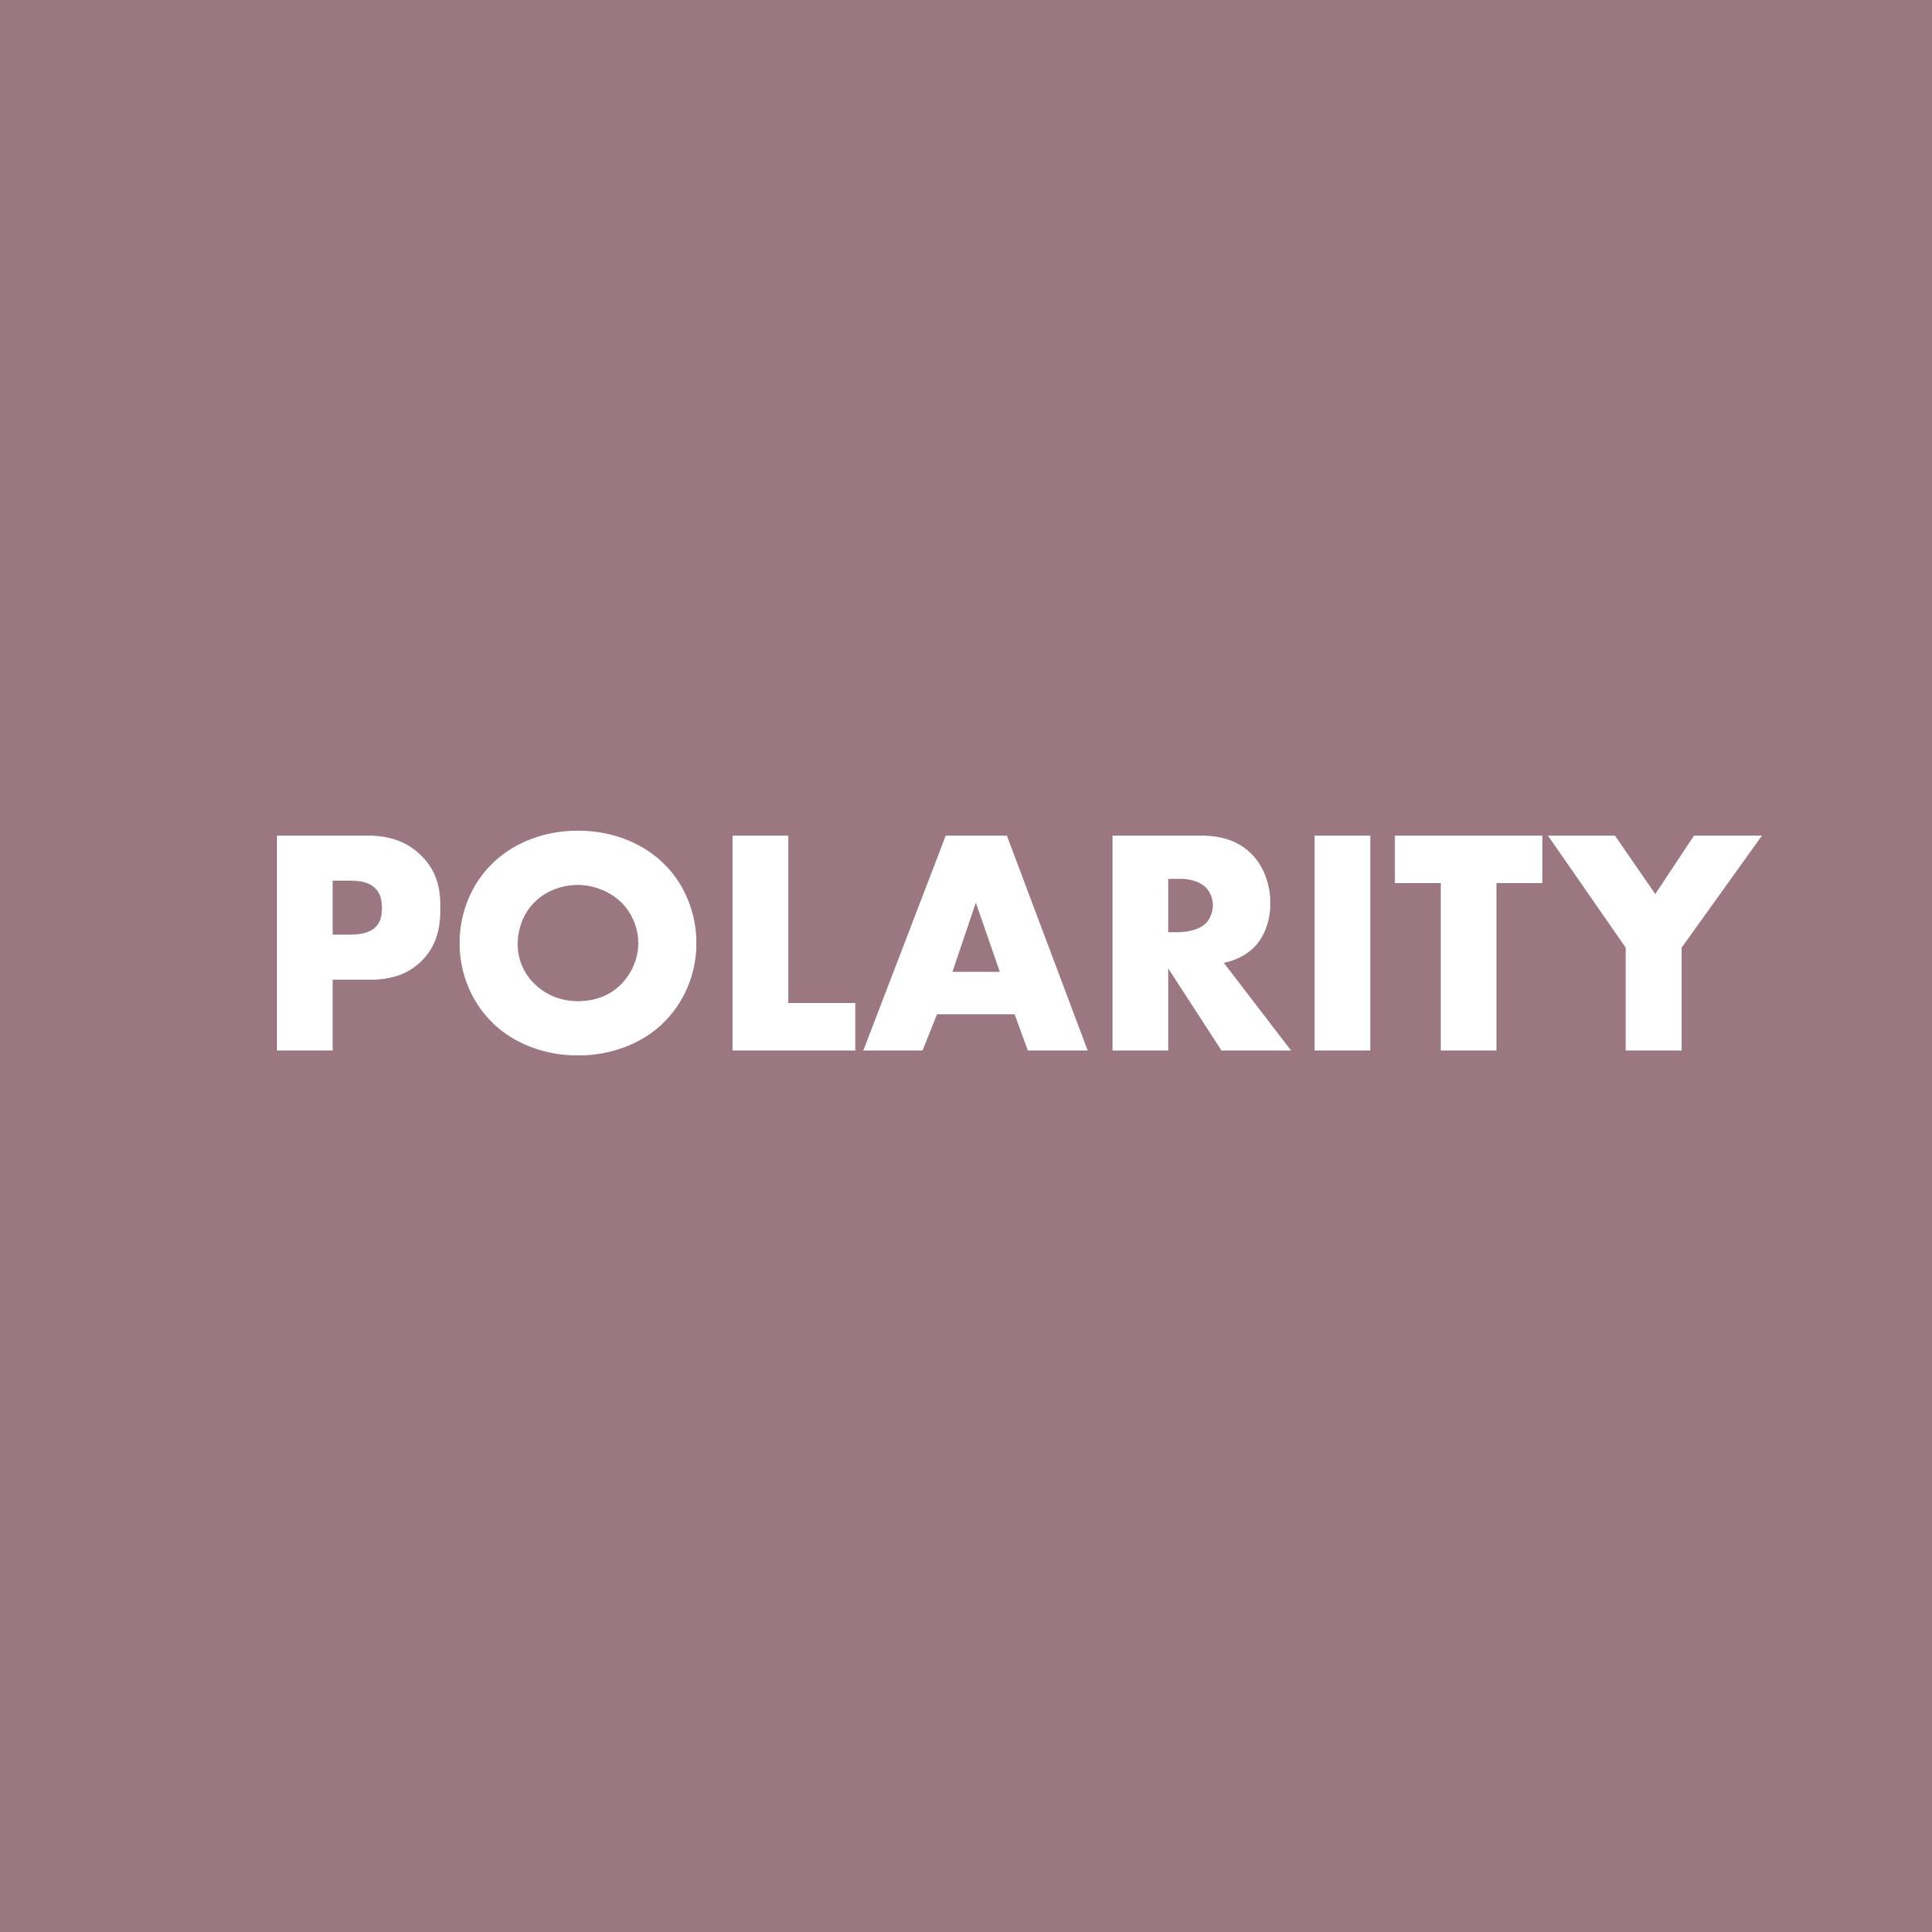 polarity.jpg